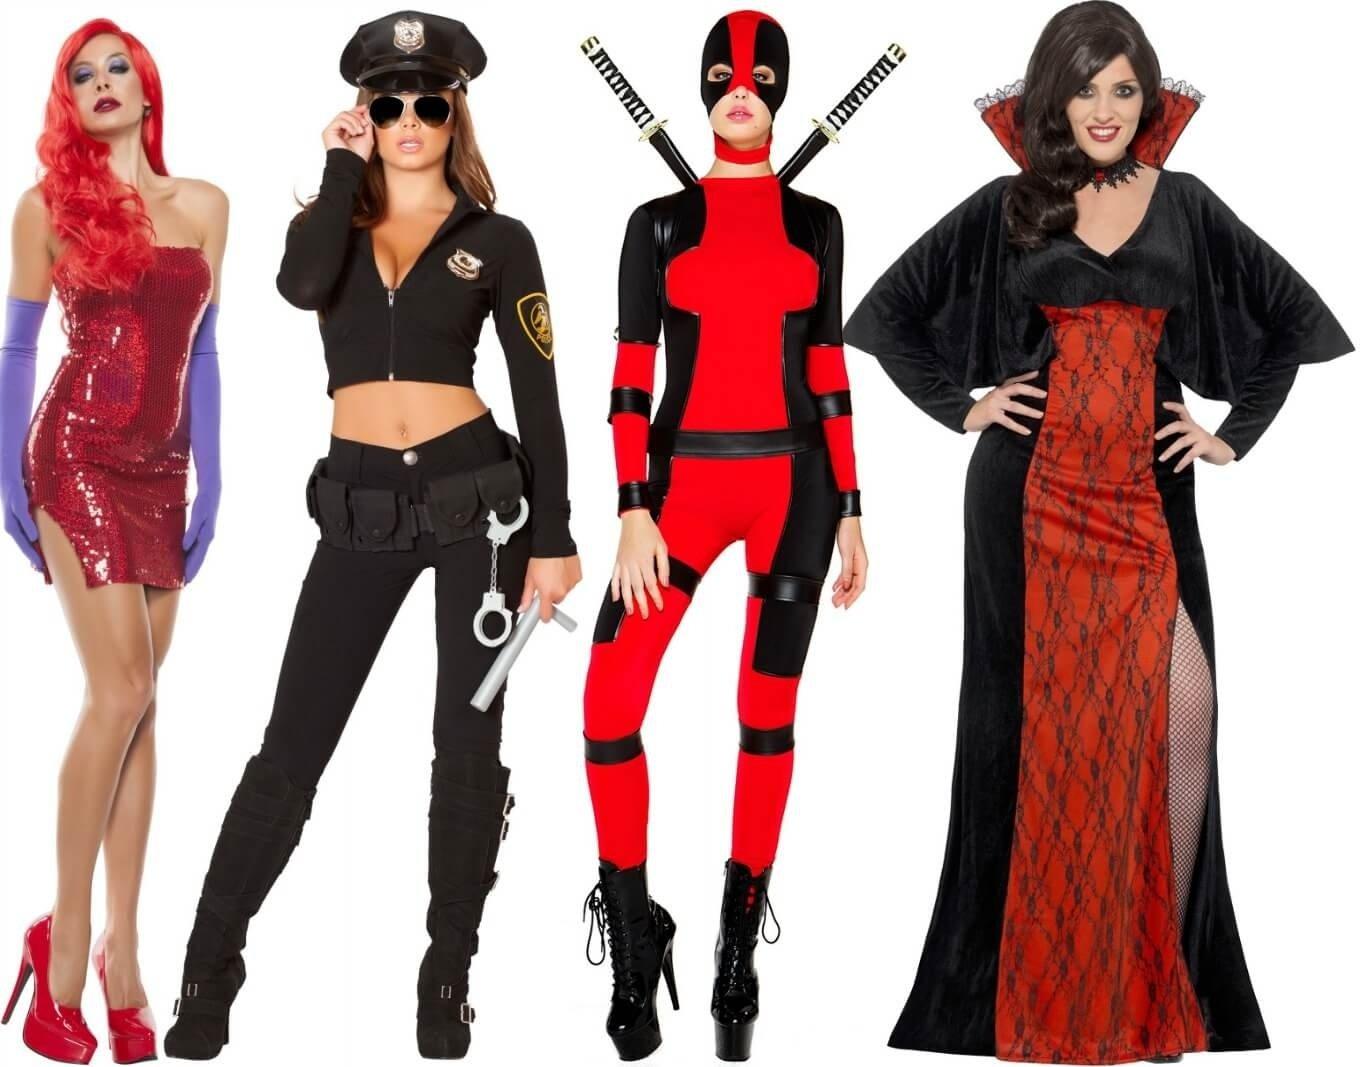 10 Stunning Halloween Costume Ideas For Adults cheap halloween costume ideas halloween costumes blog 6